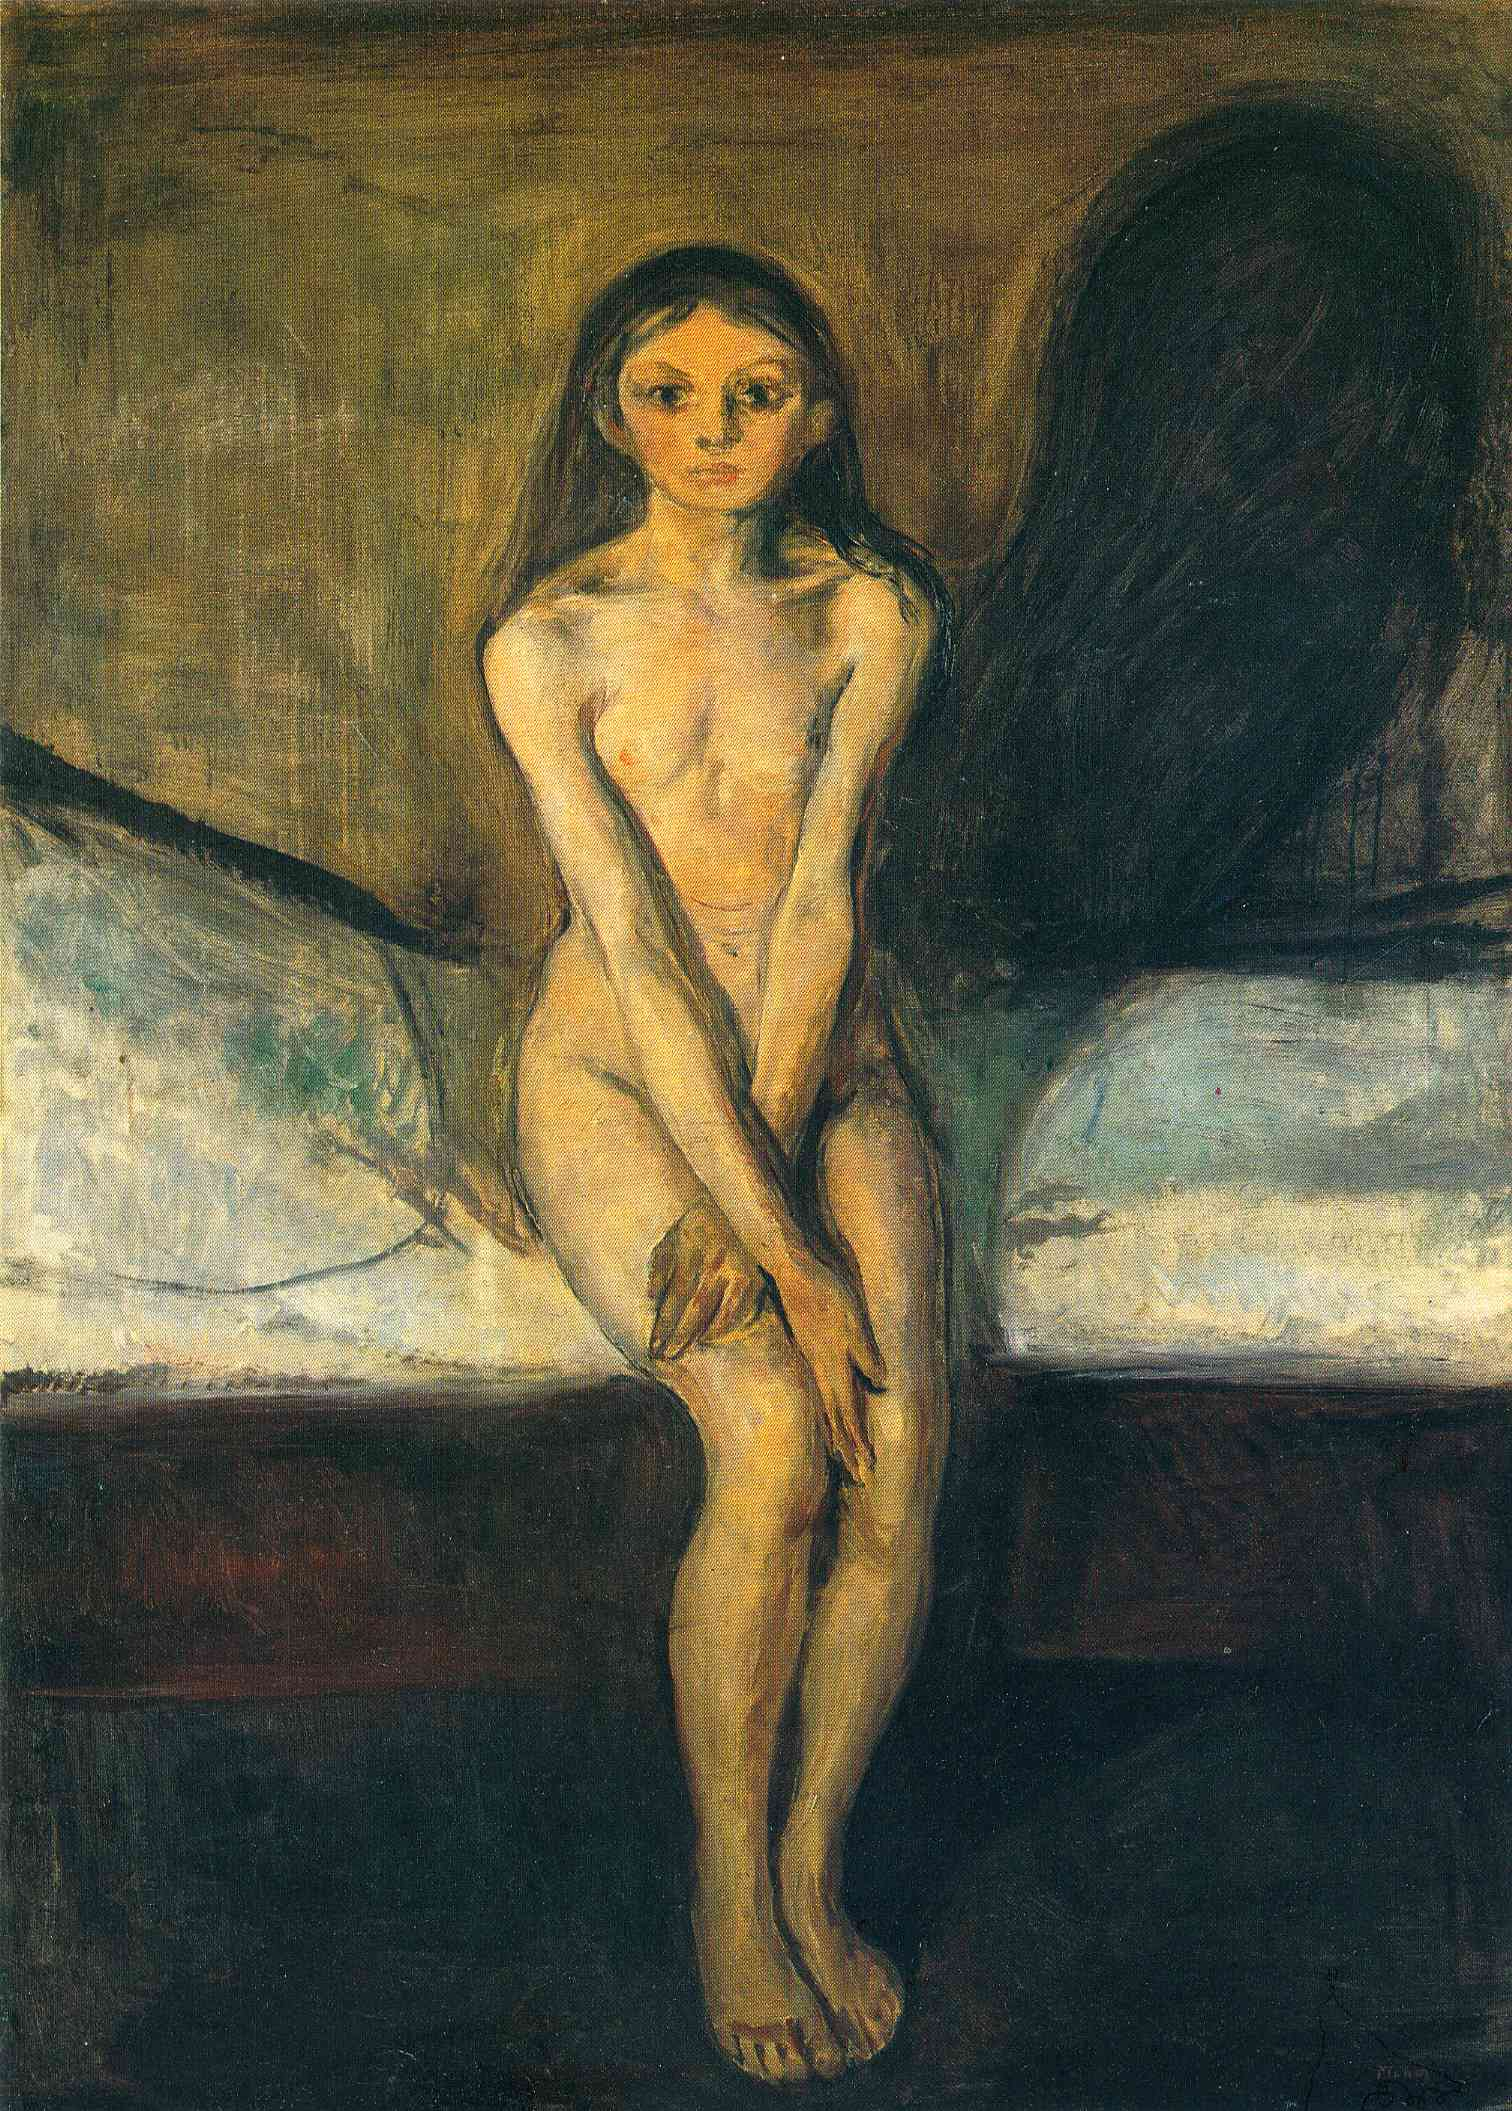 Edvard Munch / Edvard Munk  Puberty-1894